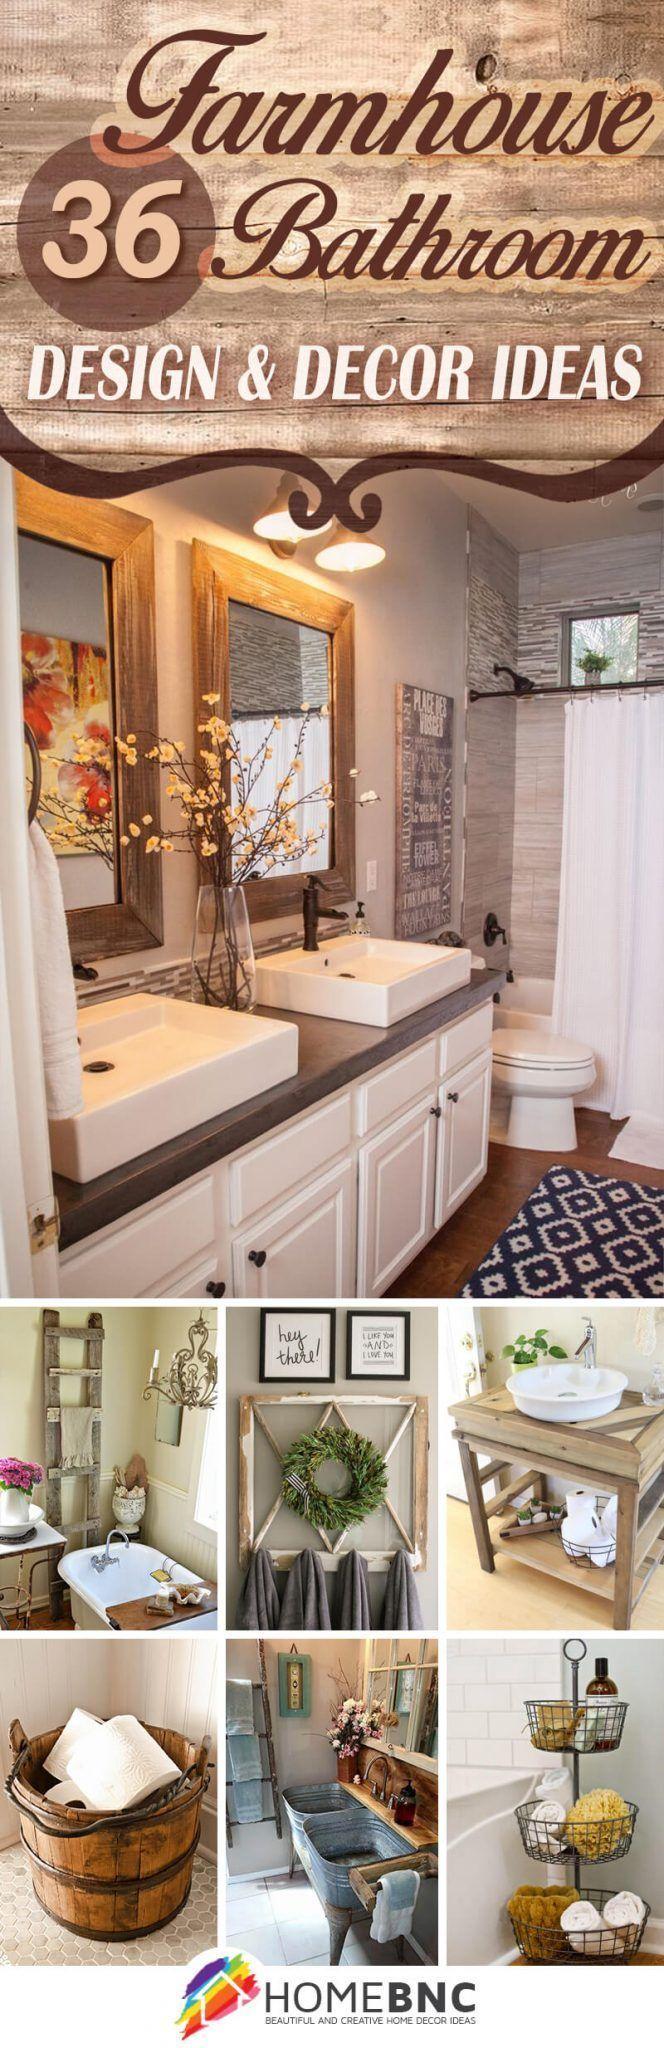 shades bathroom furniture uk%0A    Beautiful Farmhouse Bathroom Design and Decor Ideas You Will Go Crazy For